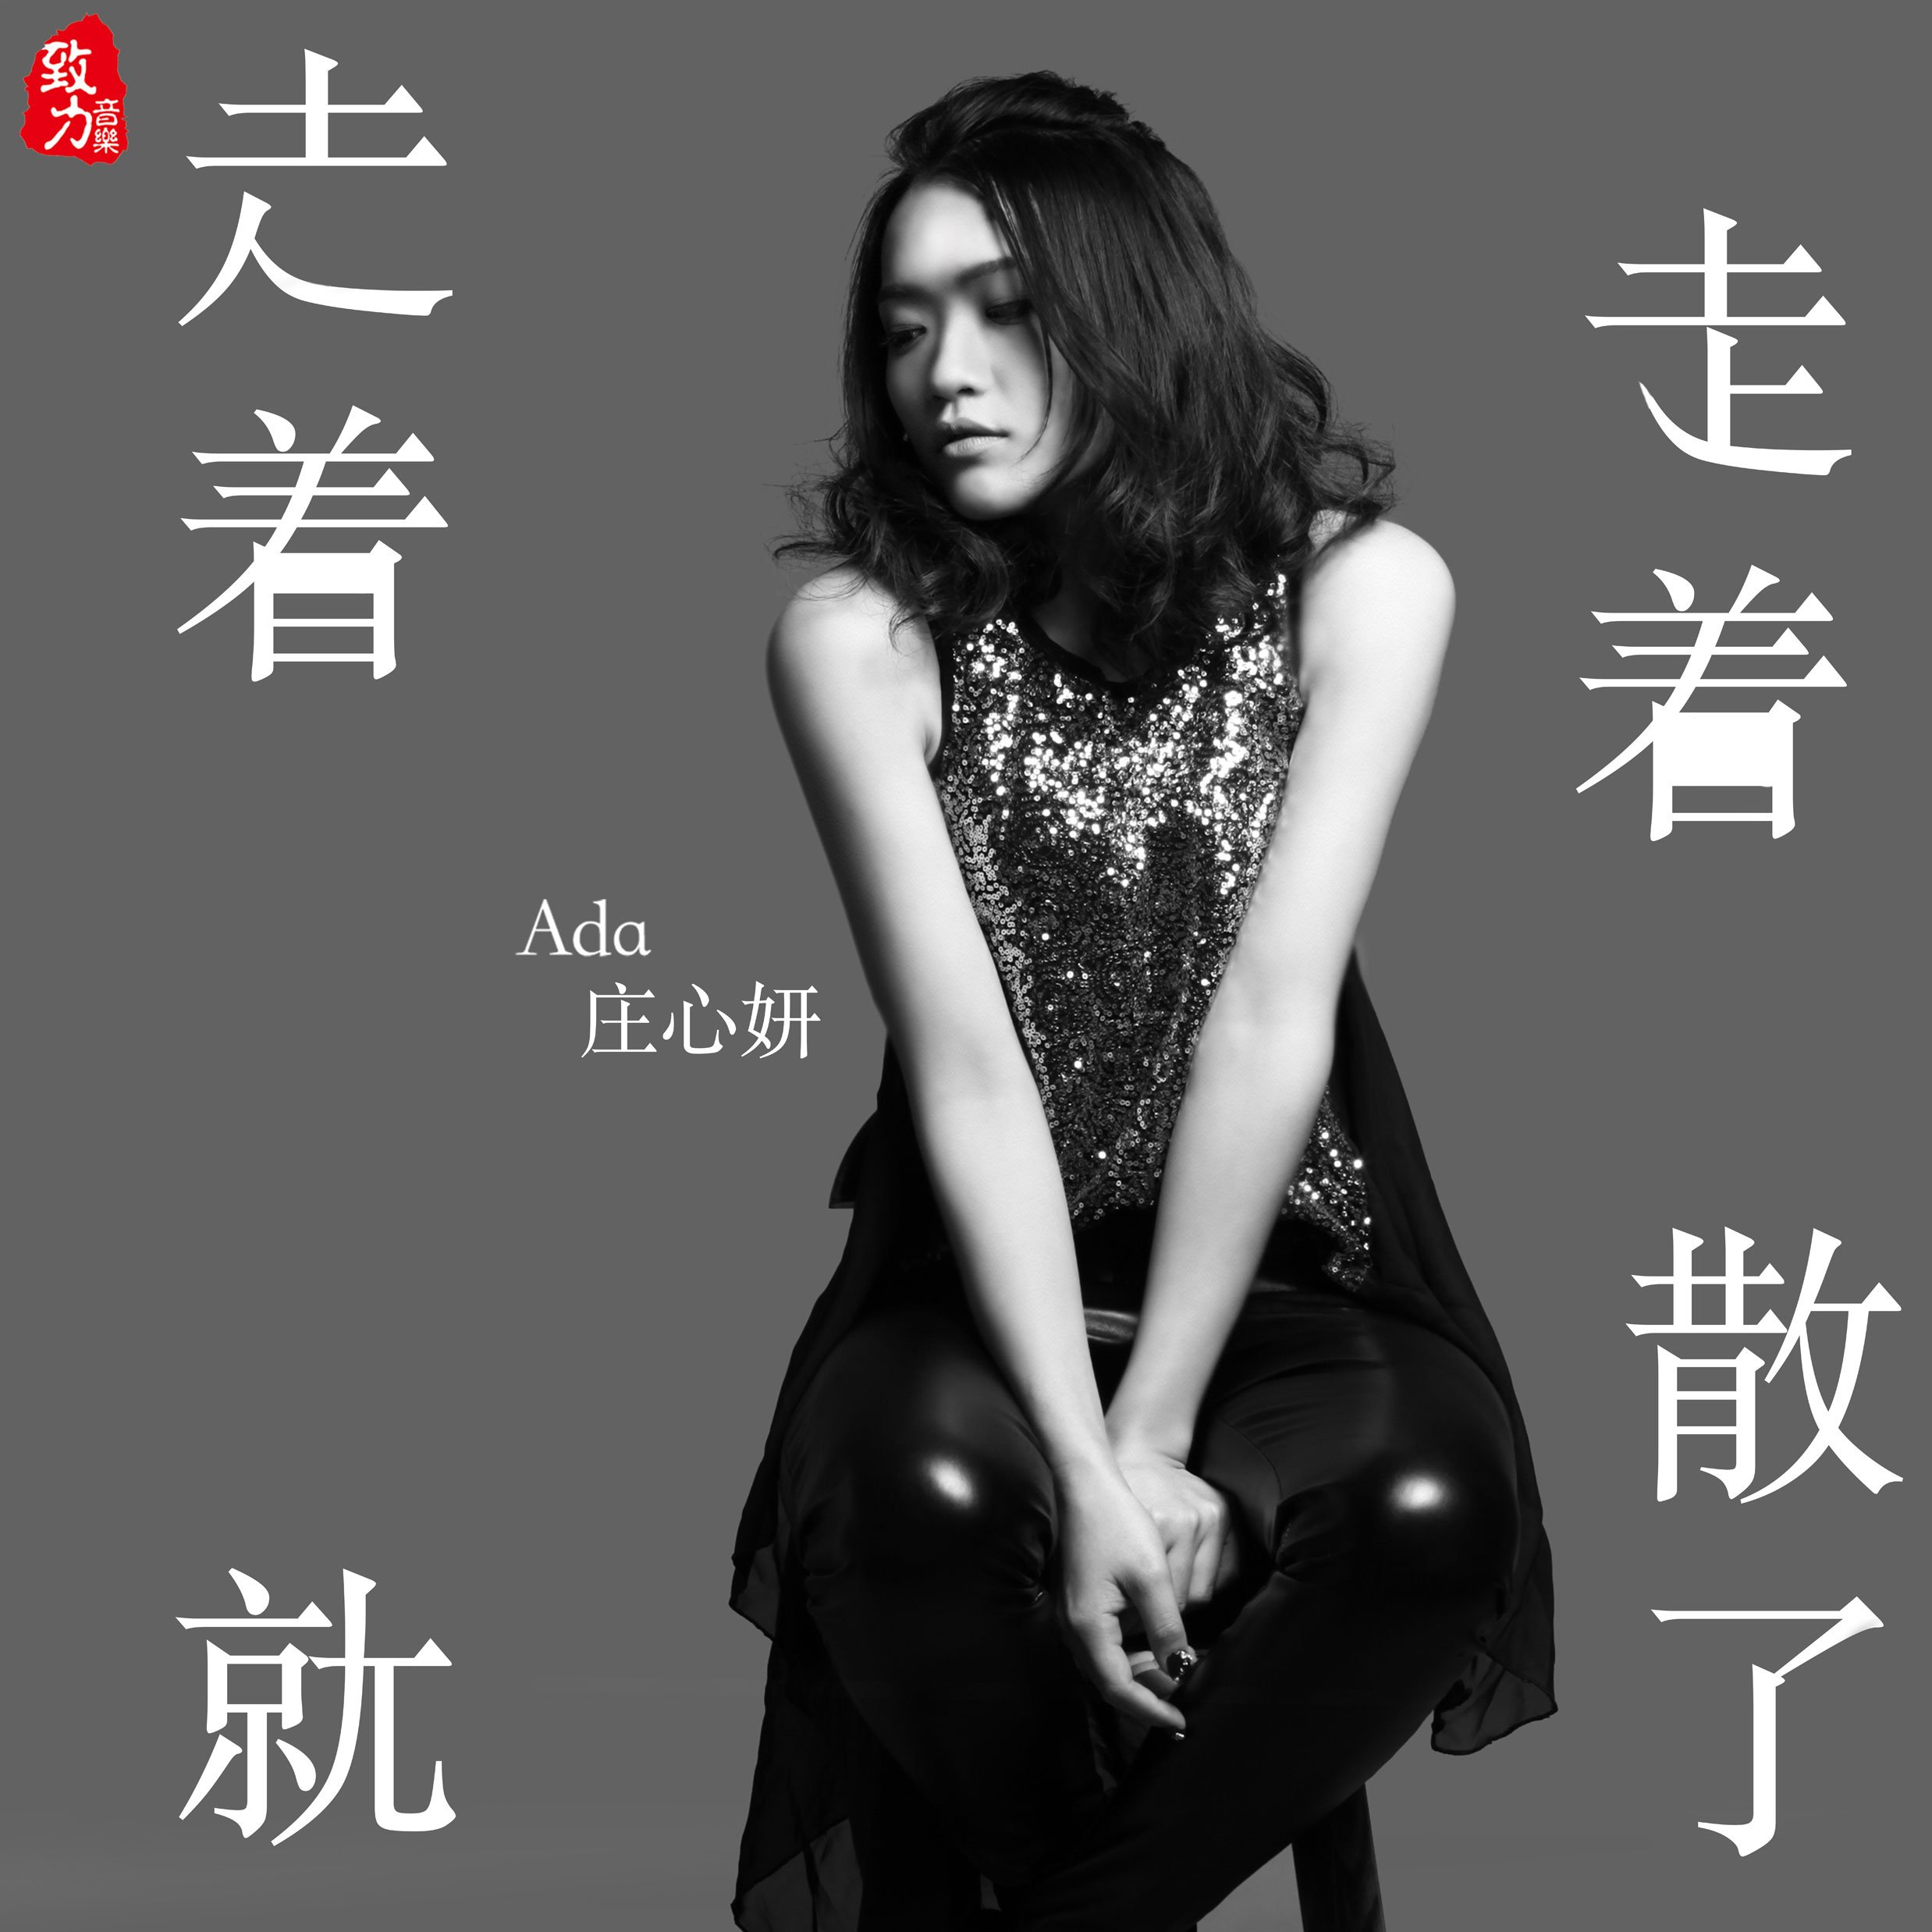 Ada Zhuang 好可惜 Album